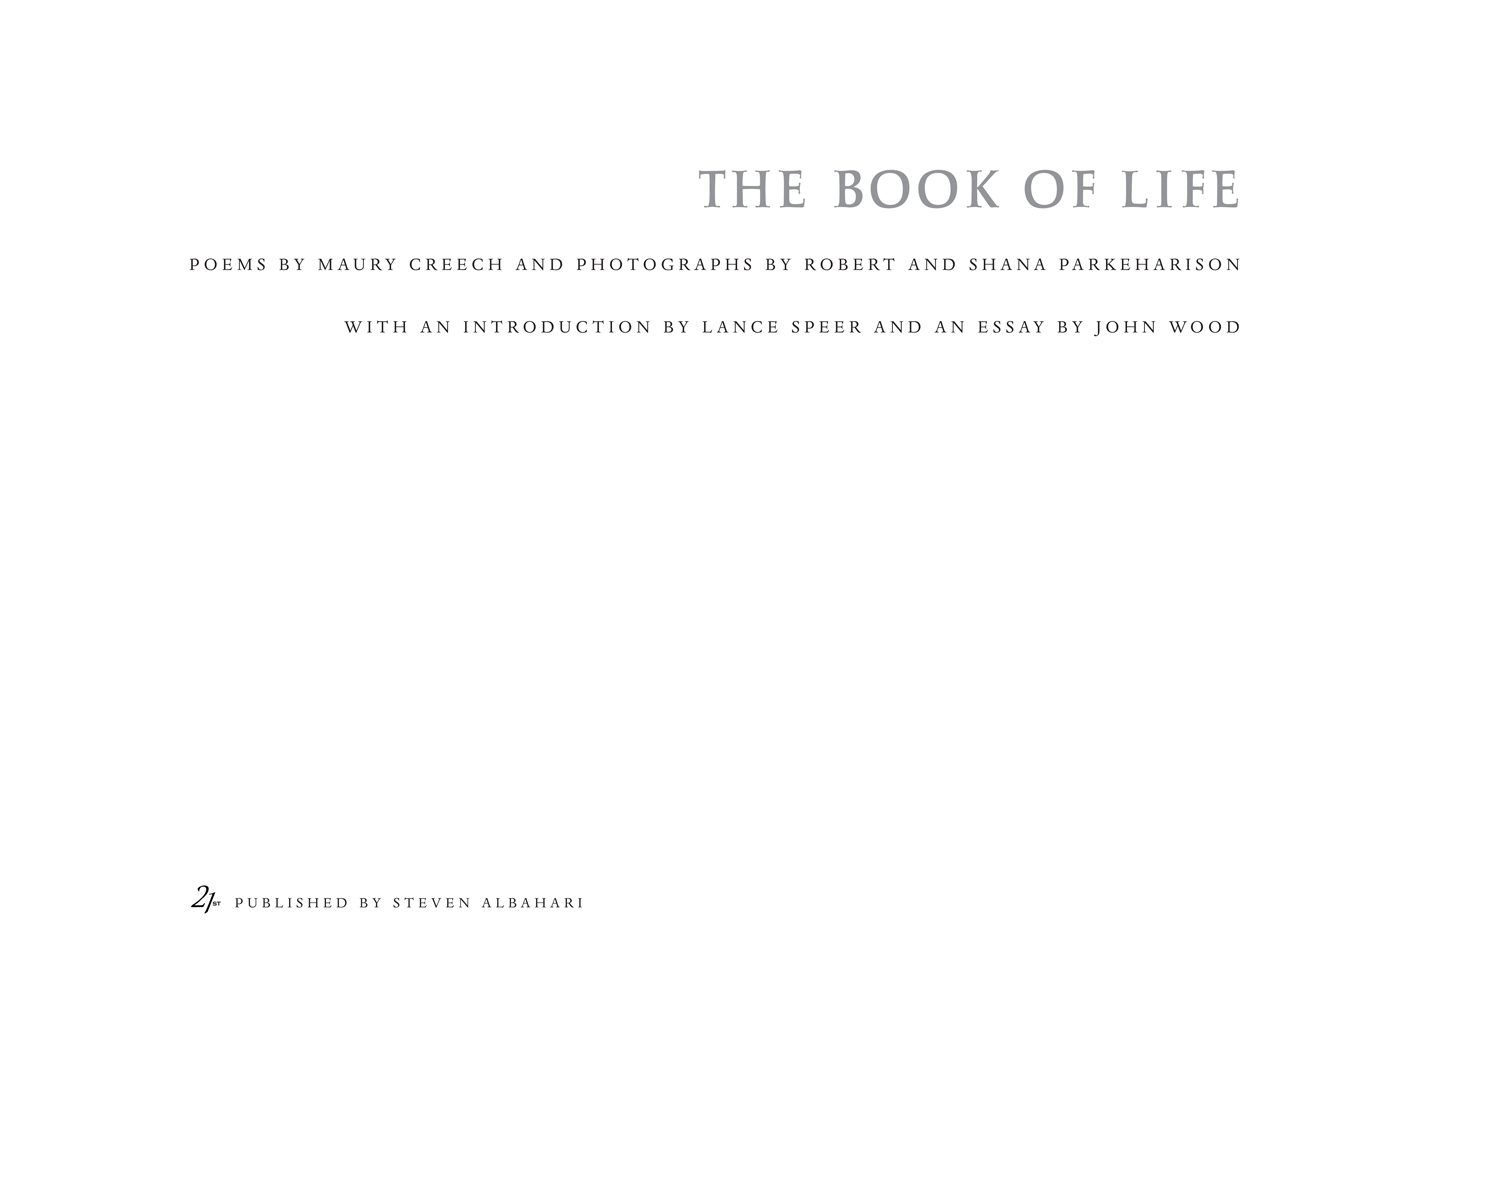 The Book of Life, Robert and Shana ParkeHarrison